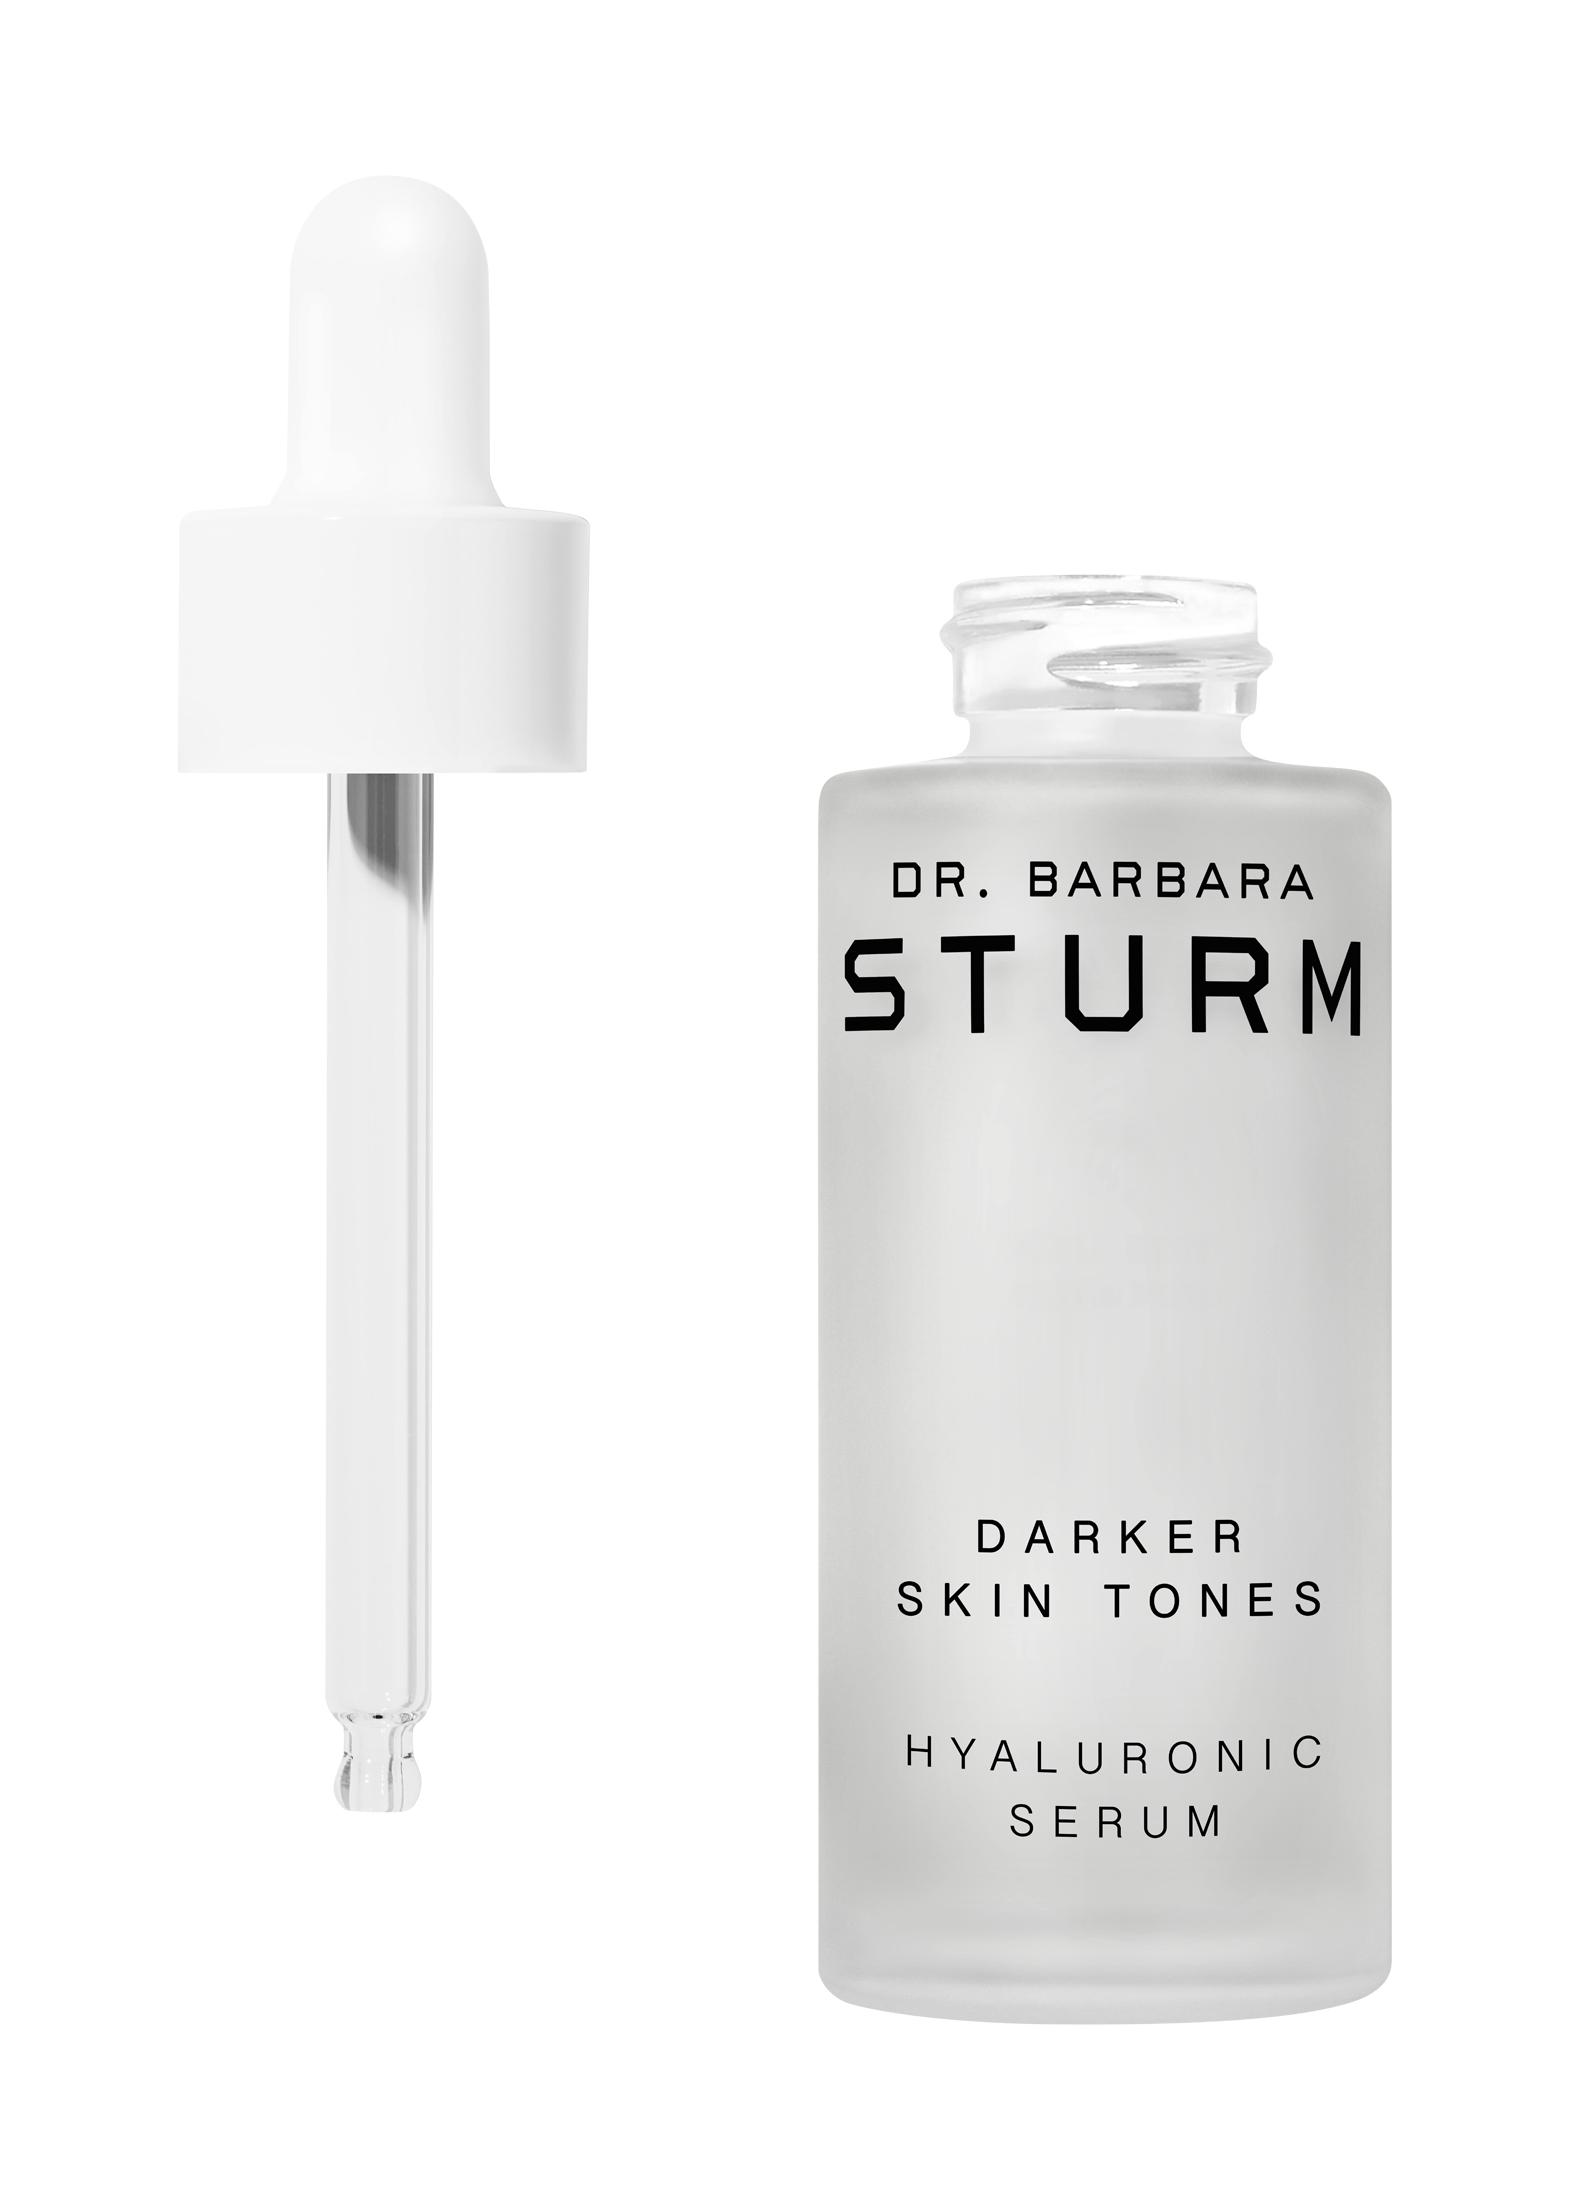 Darker Skin Tones Hyaluronic Serum 30ml image number 1